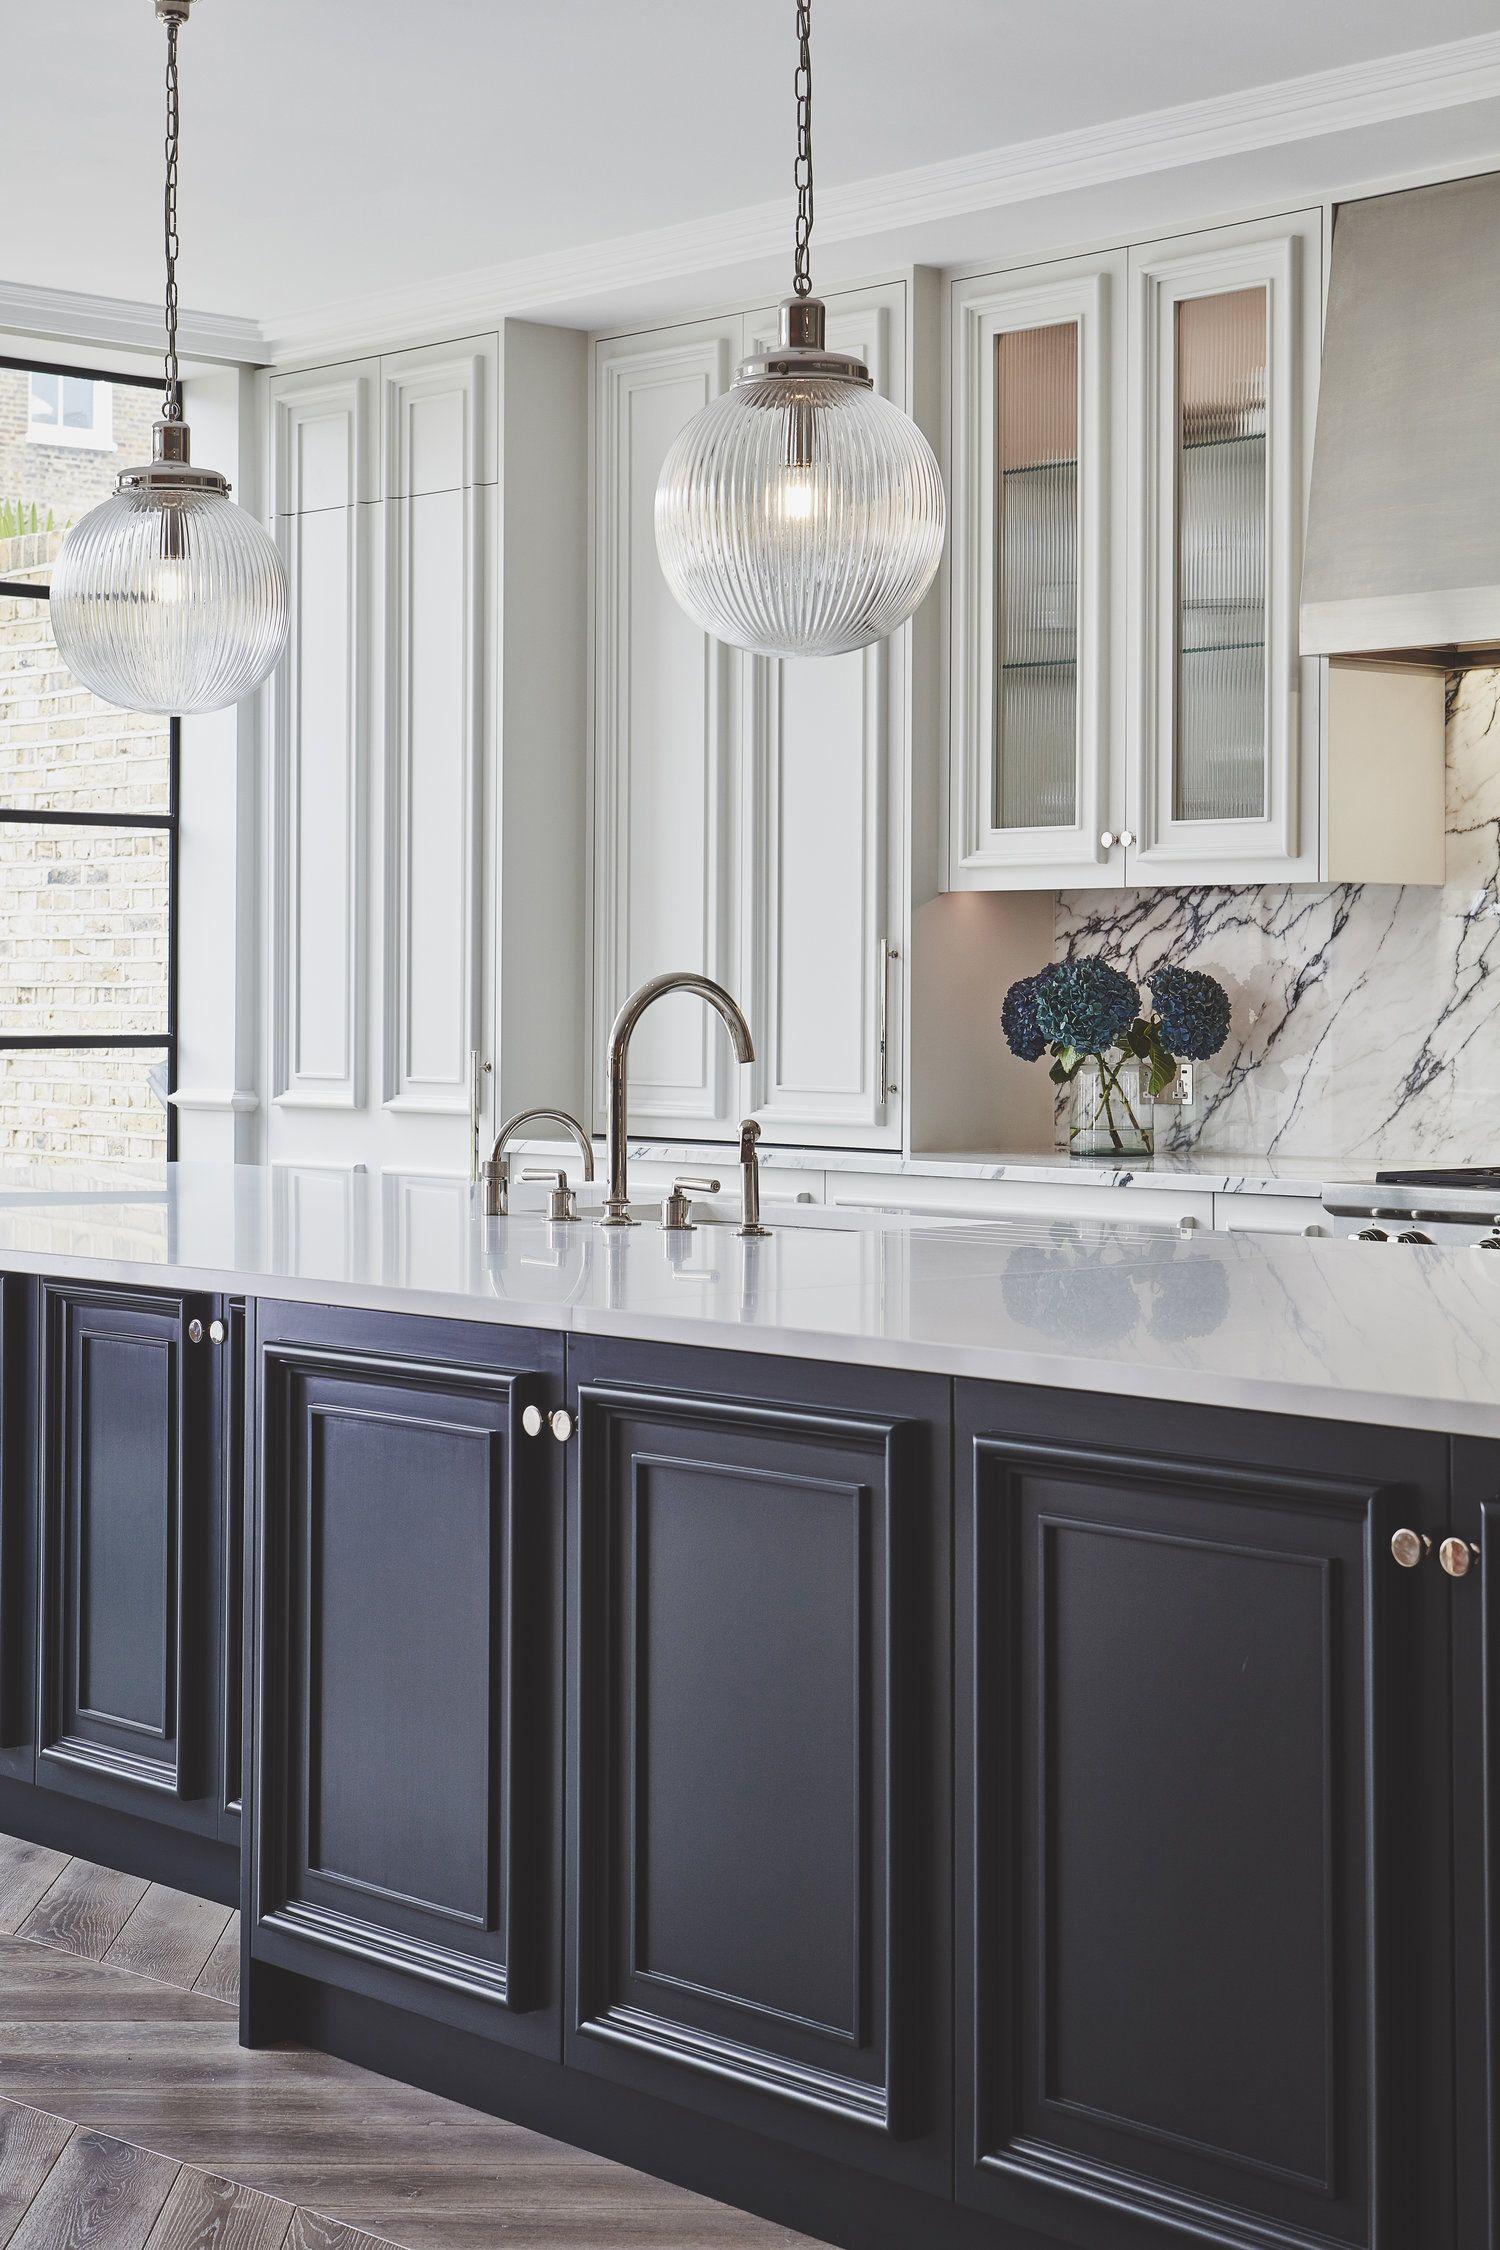 Sudbrooke Blakes London Glass Kitchen Cabinets Glass Kitchen Cabinet Doors Black Kitchen Cabinets